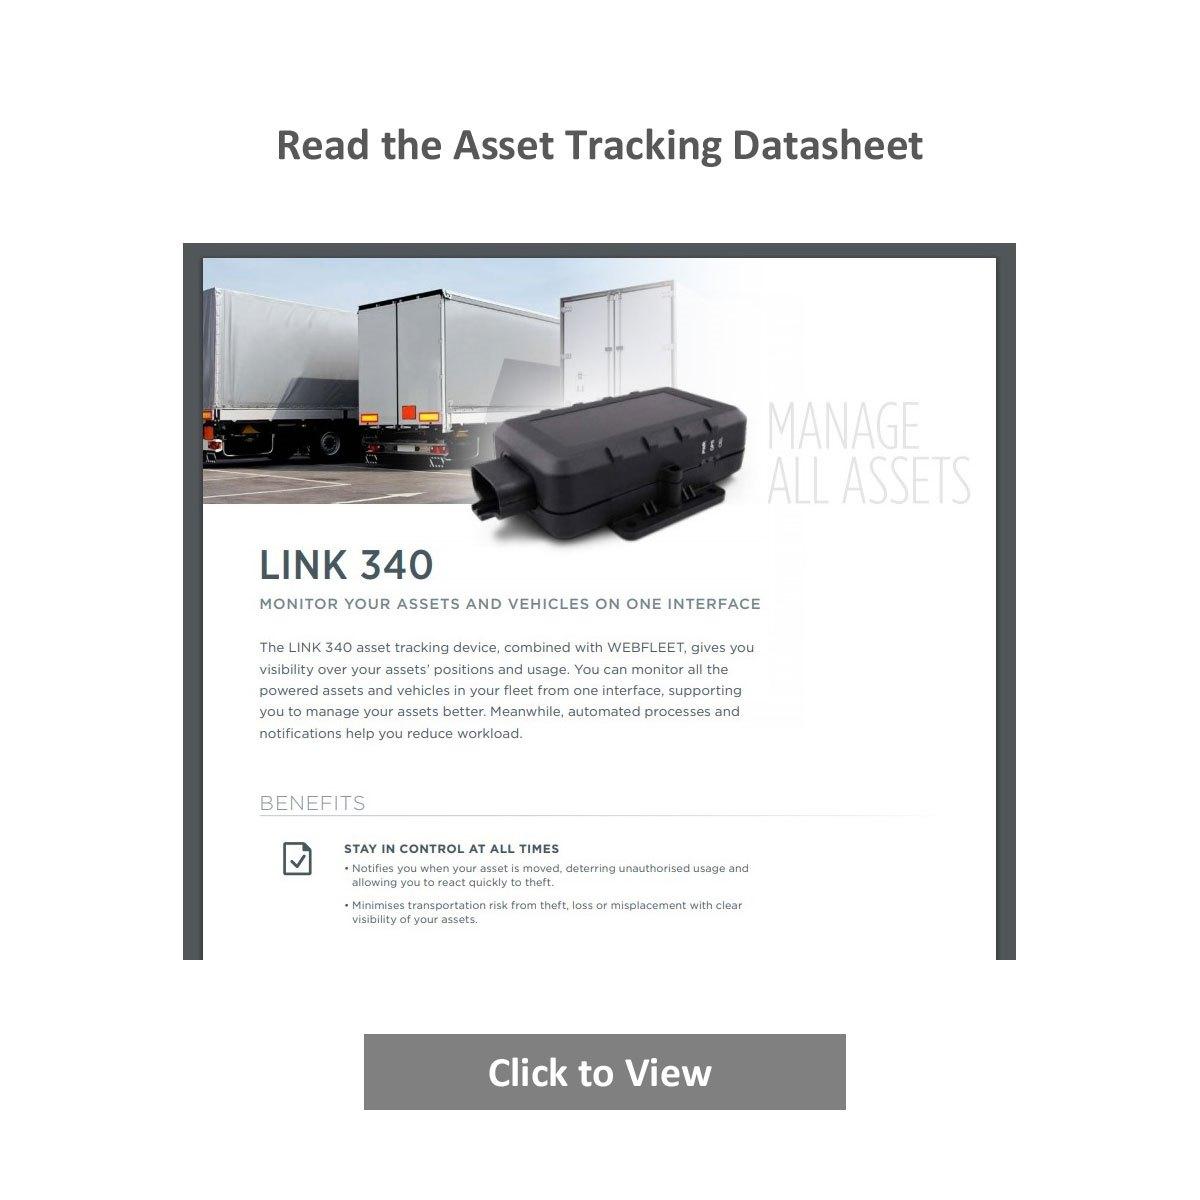 Link 340 Asset Tracking Datasheet